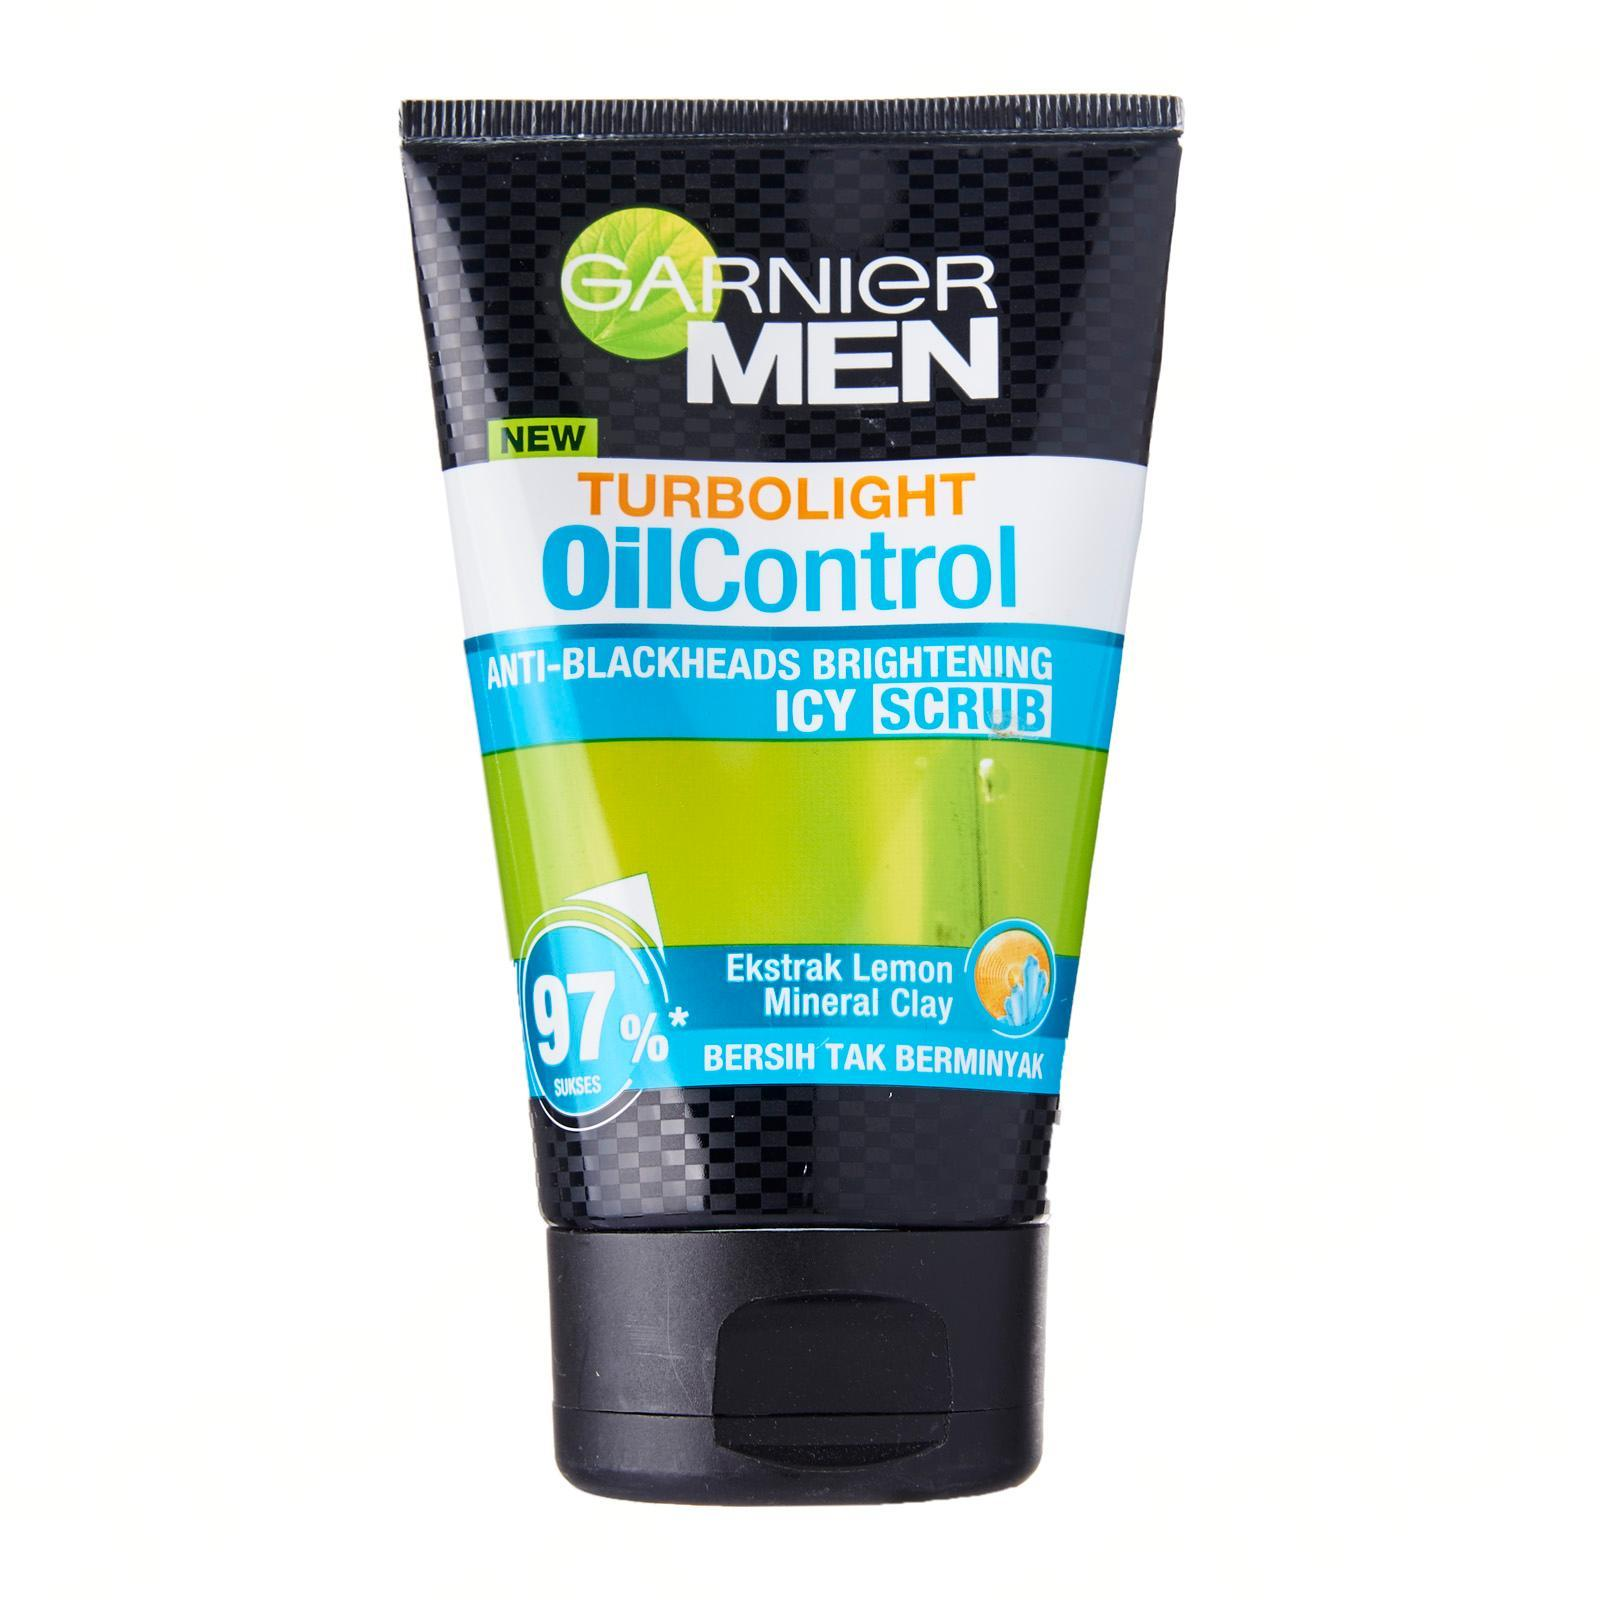 GARNIER MEN Turbo Light Oil Control Icy Scrub